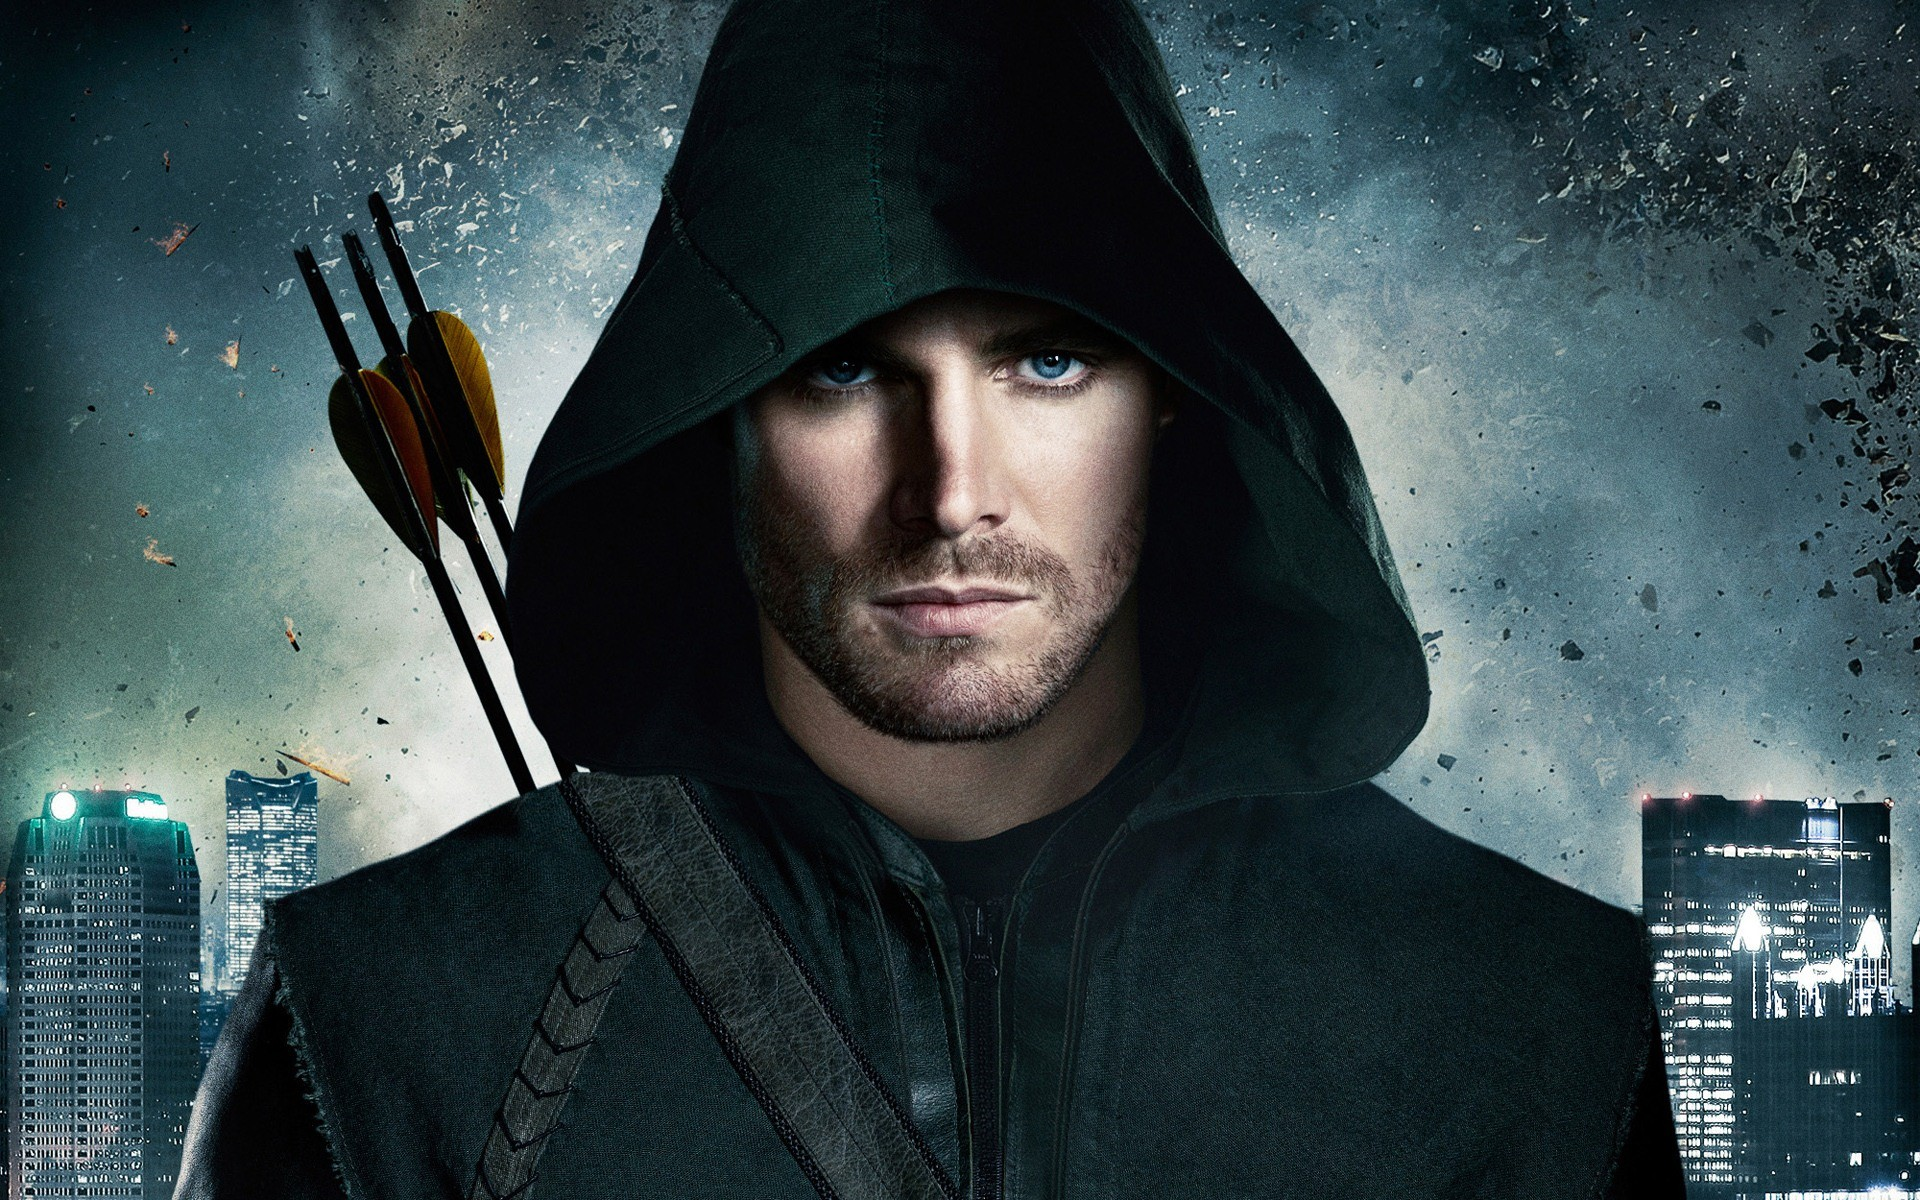 Oliver Queen Of Arrows Arrow Tv Series 71052 HD Wallpaper Res 1920x1200